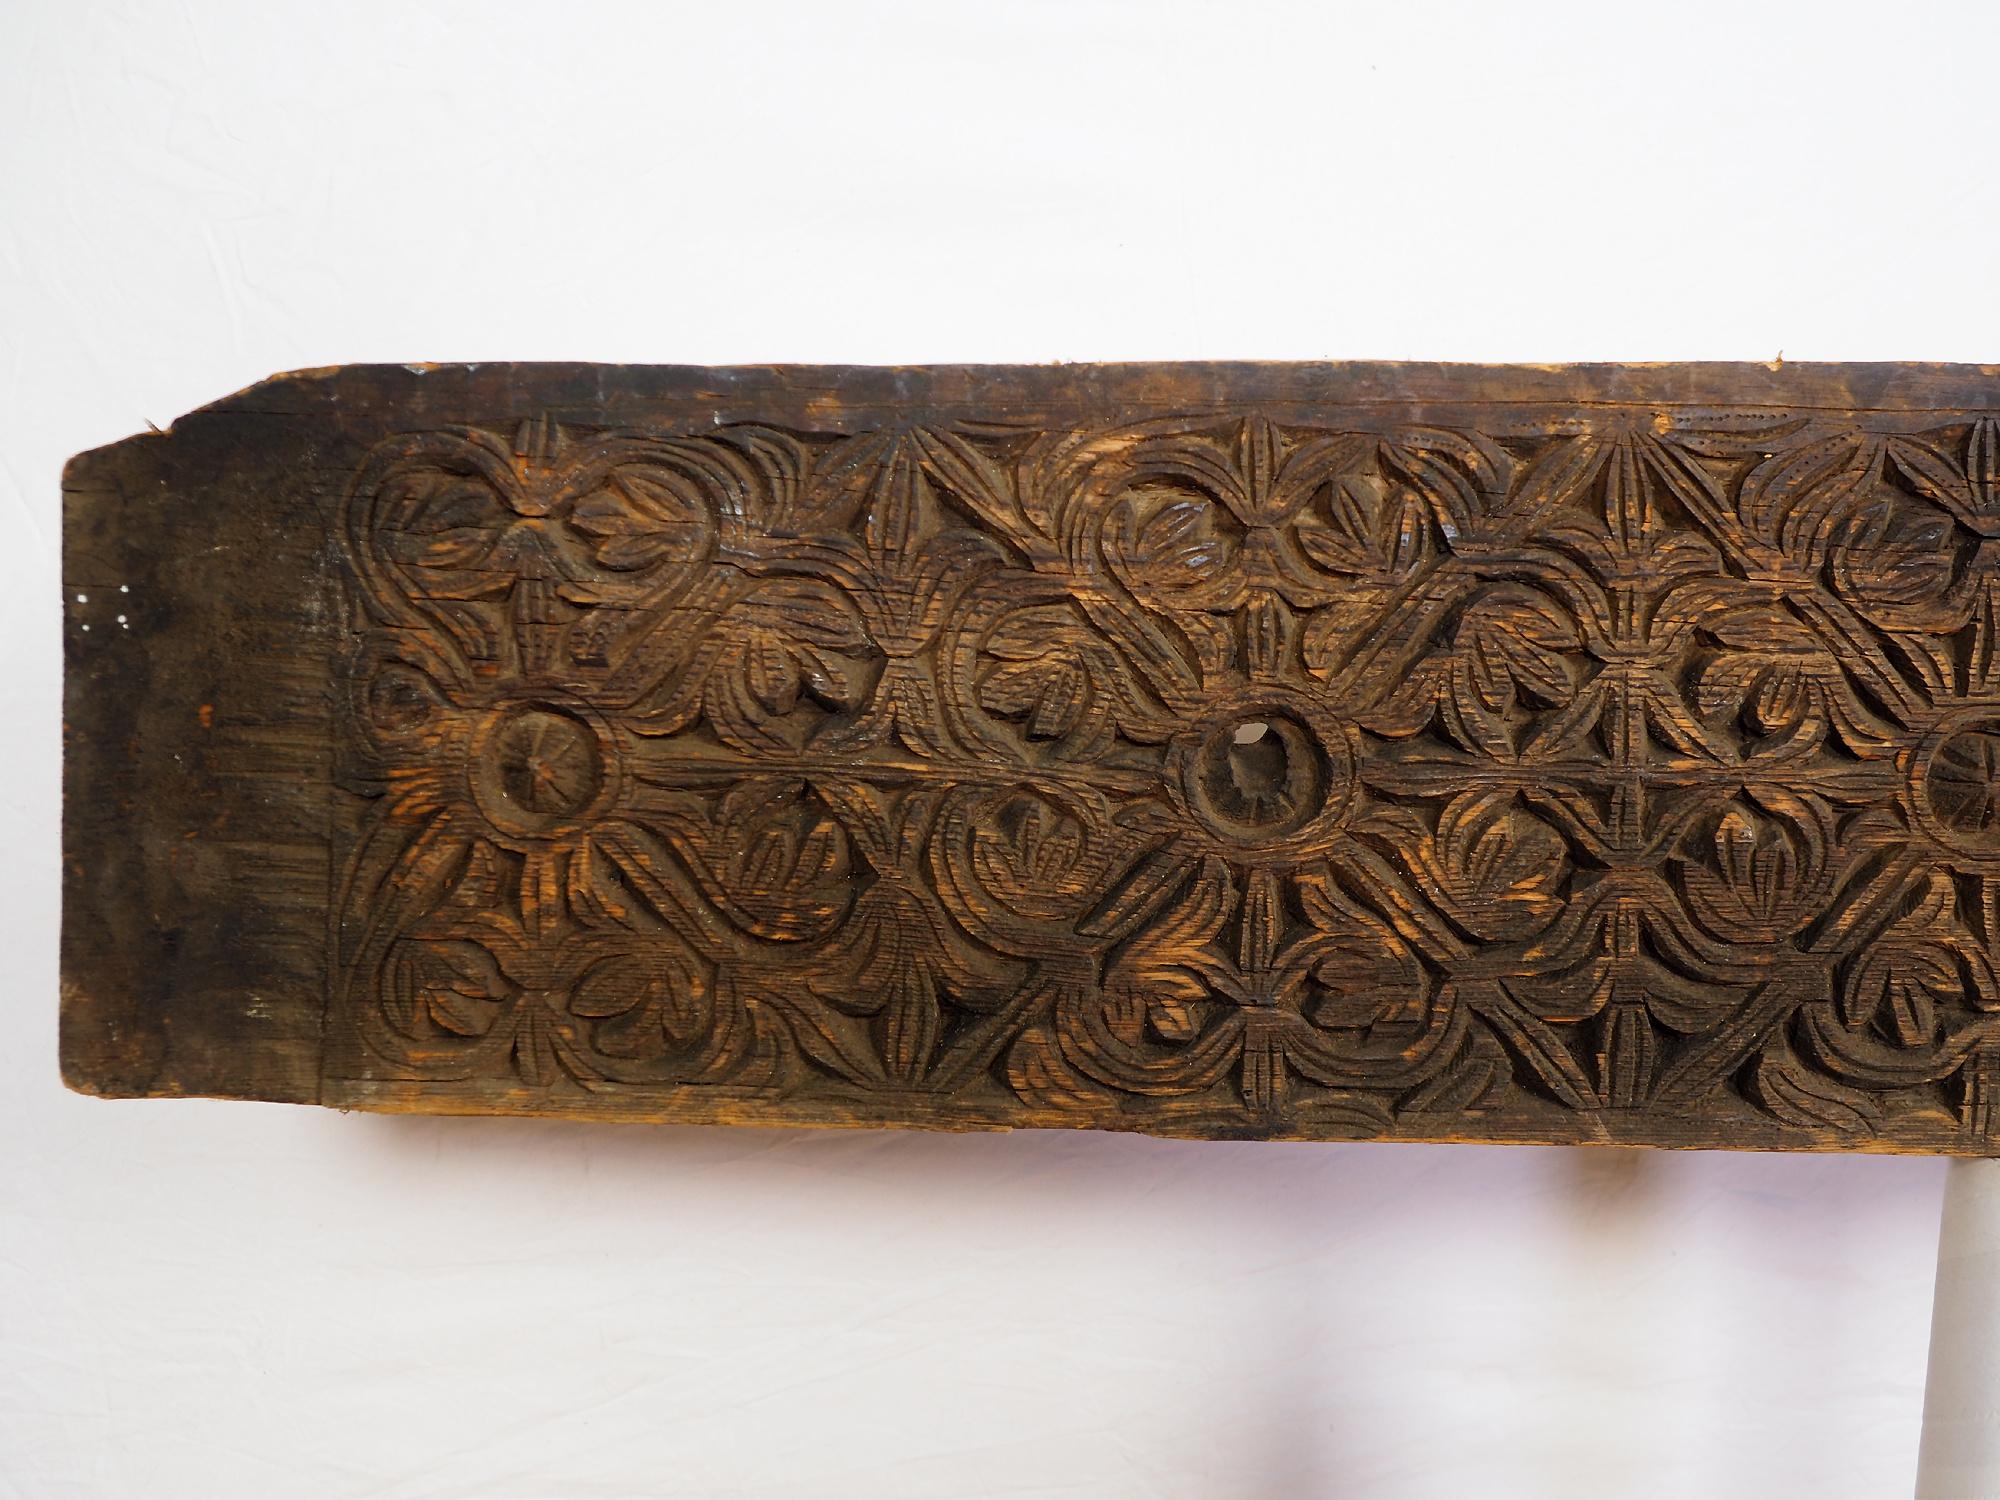 133 cm x 26 cm antik orient handgeschnitzte Massiv Holz Afghanistan Nuristan Panel Pakistan Swat-Valley 18/19 Jh. Nr:20/F